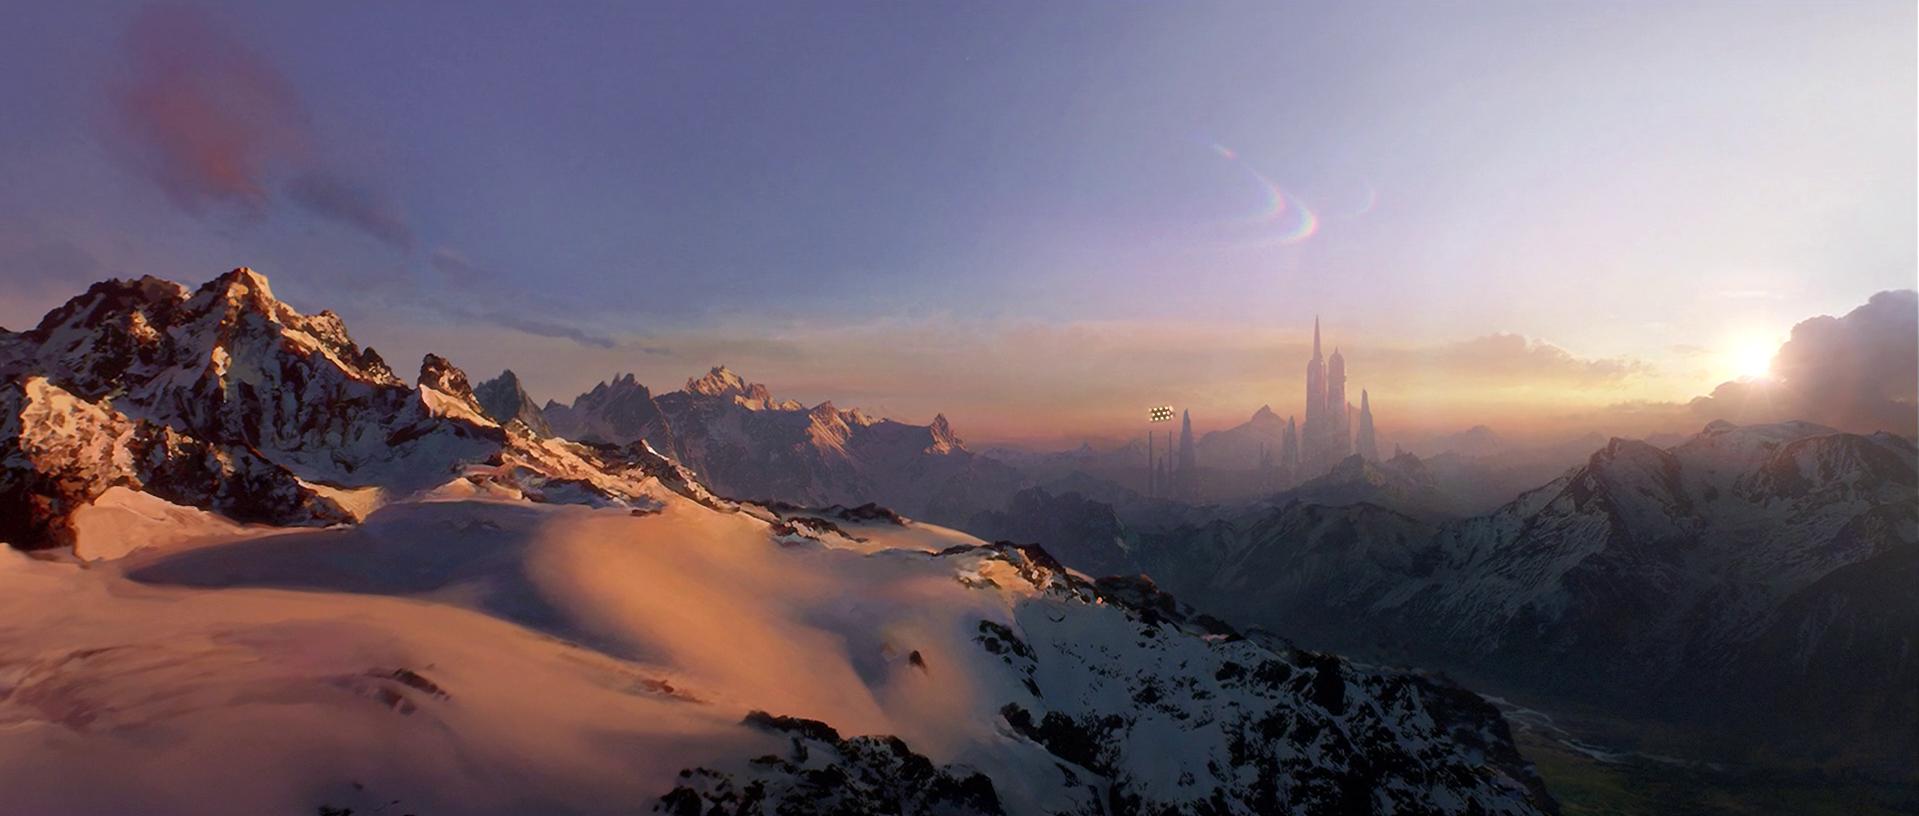 Image Alderaan Mountains Png Wookieepedia Fandom Powered By Wikia